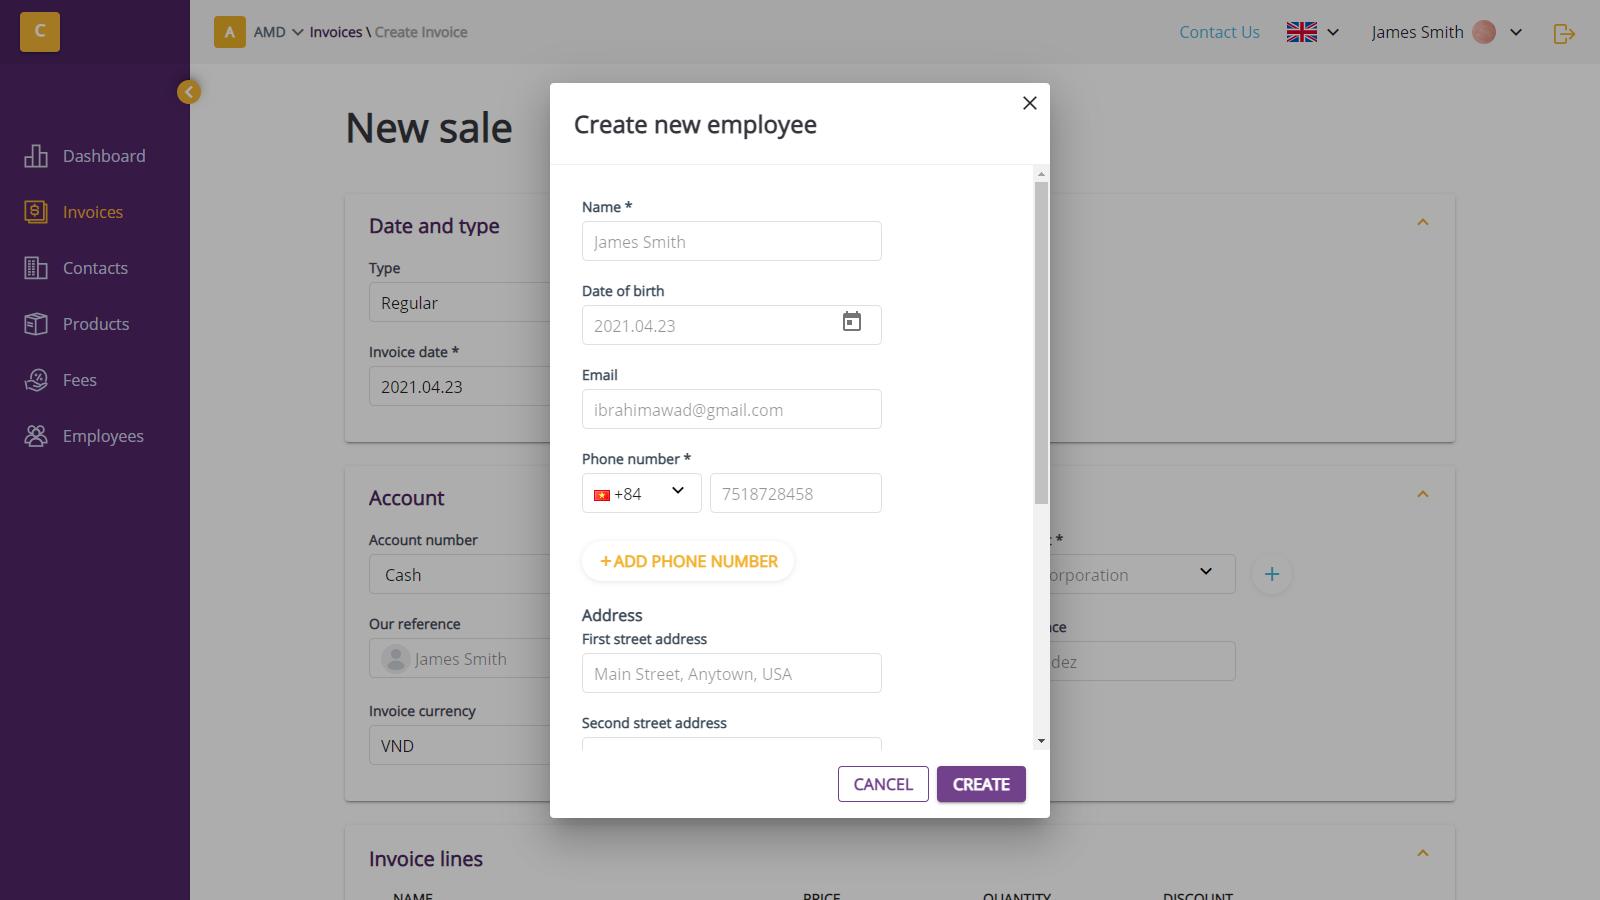 Create new employee dialog